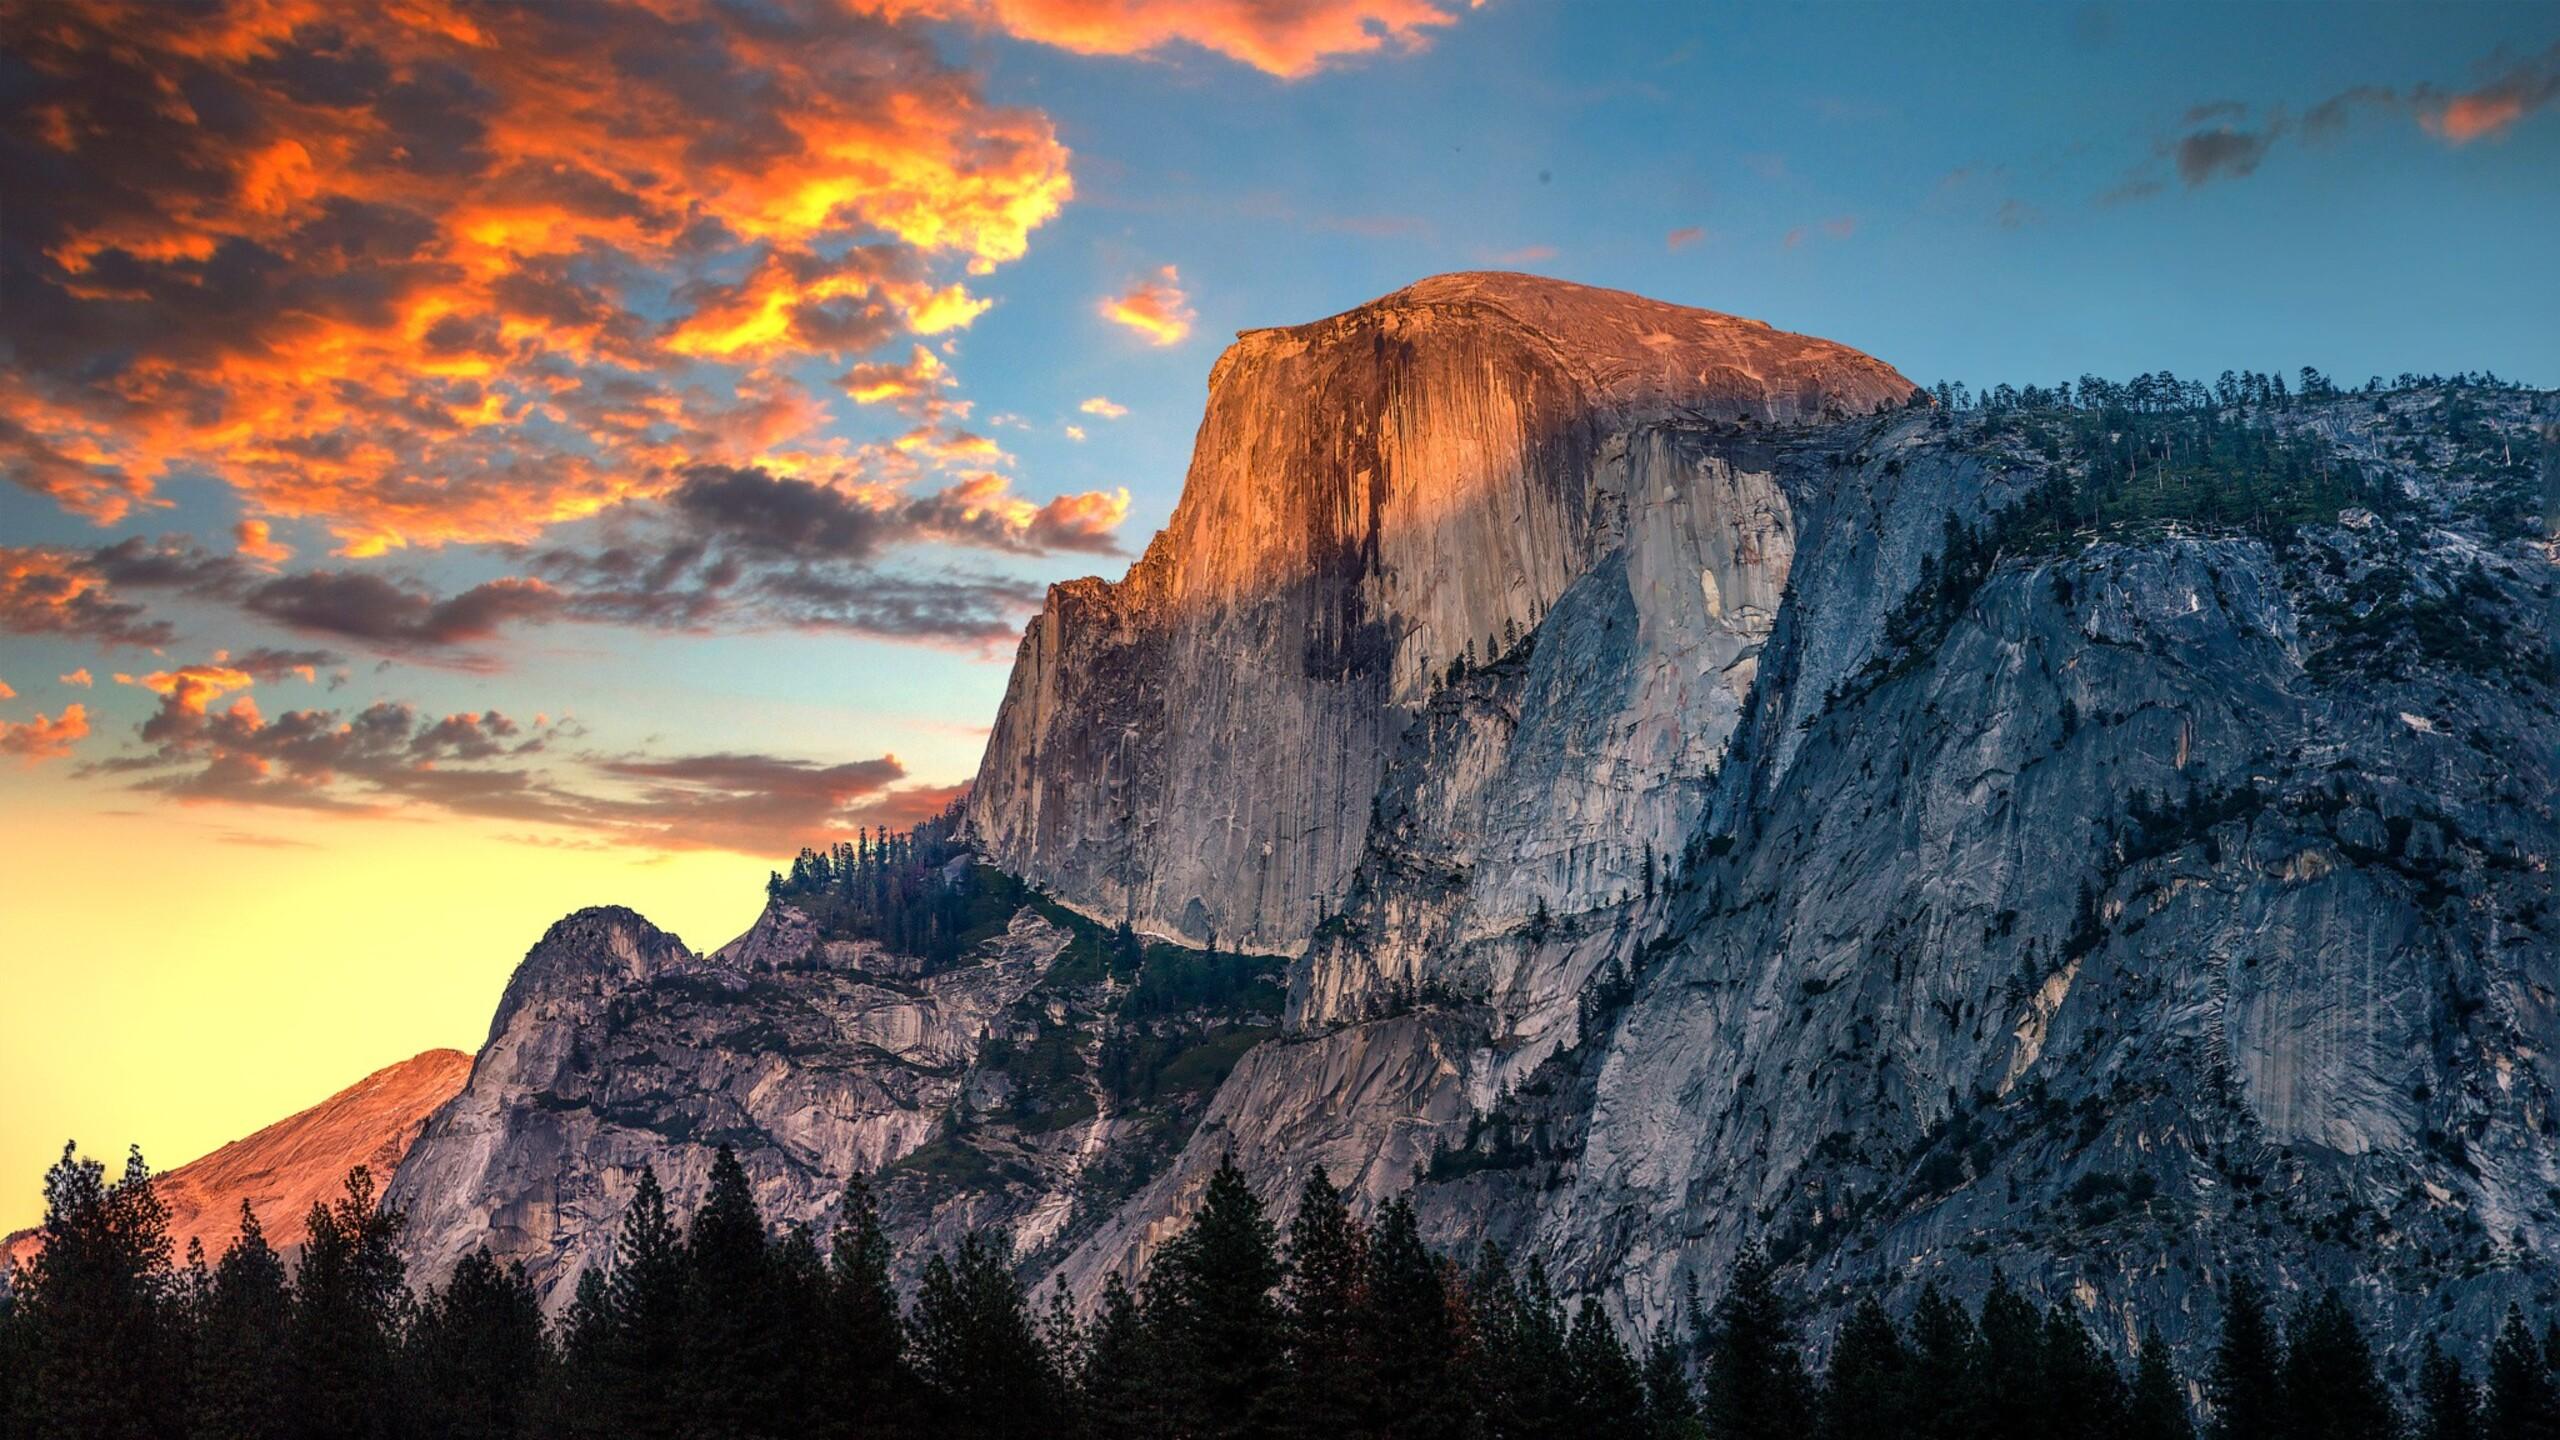 Wonderful Wallpaper Mountain 1440p - beautiful-mountains-wallpaper-2560x1440  Photograph_361213.jpg